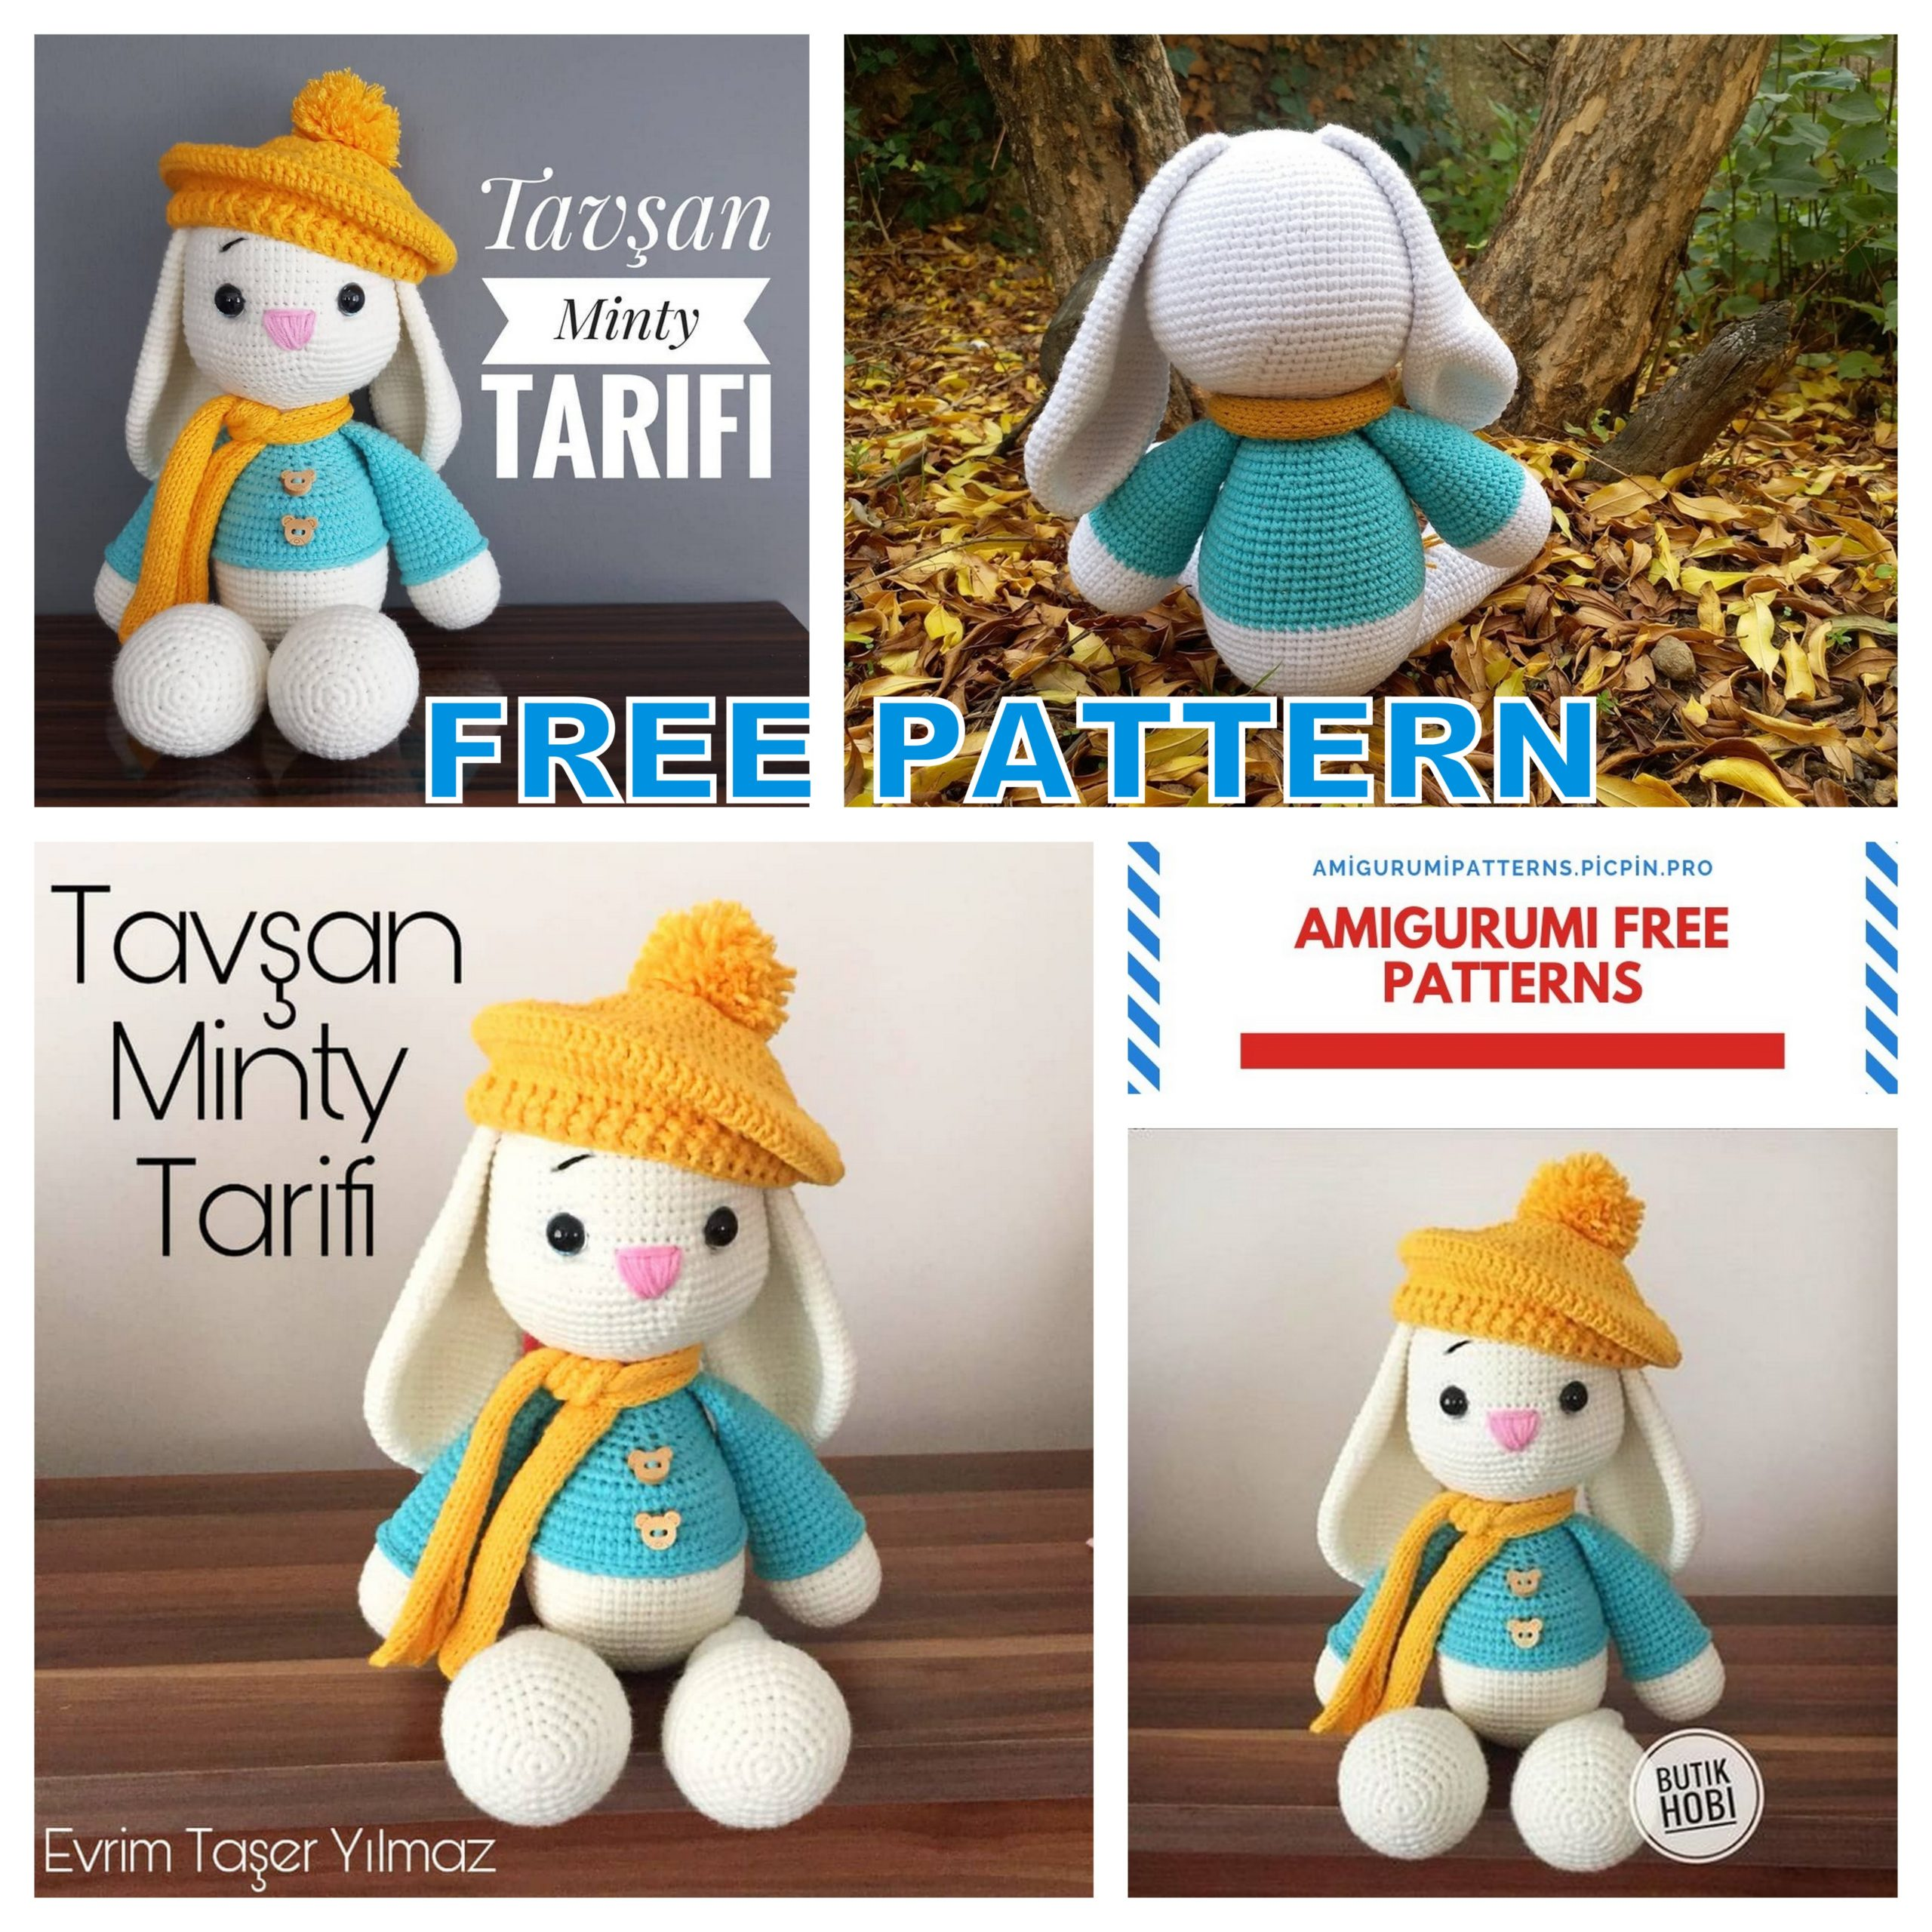 Ücretsiz Amigurumi Tarifleri added 4 new... - Ücretsiz Amigurumi ... | 2560x2560